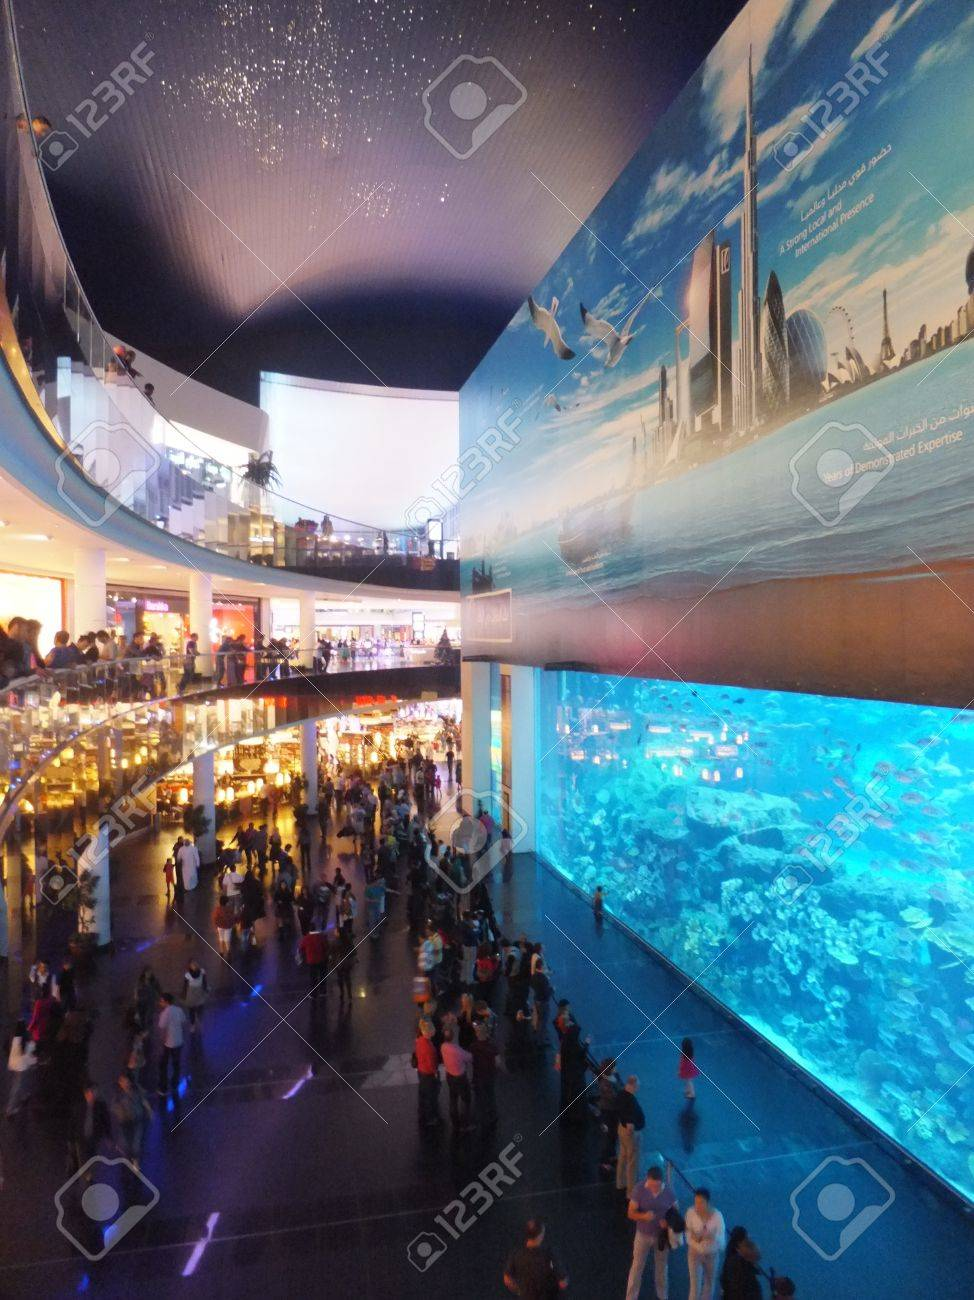 Plus Grand Aquarium Du Monde : grand, aquarium, monde, DUBAI,, Émirats, Arabes, Décembre:, L'aquarium, Centre, Commercial, Dubai, Dubaï,, Decemebr, 2011., Grand, Aquarium, Couvert, Monde